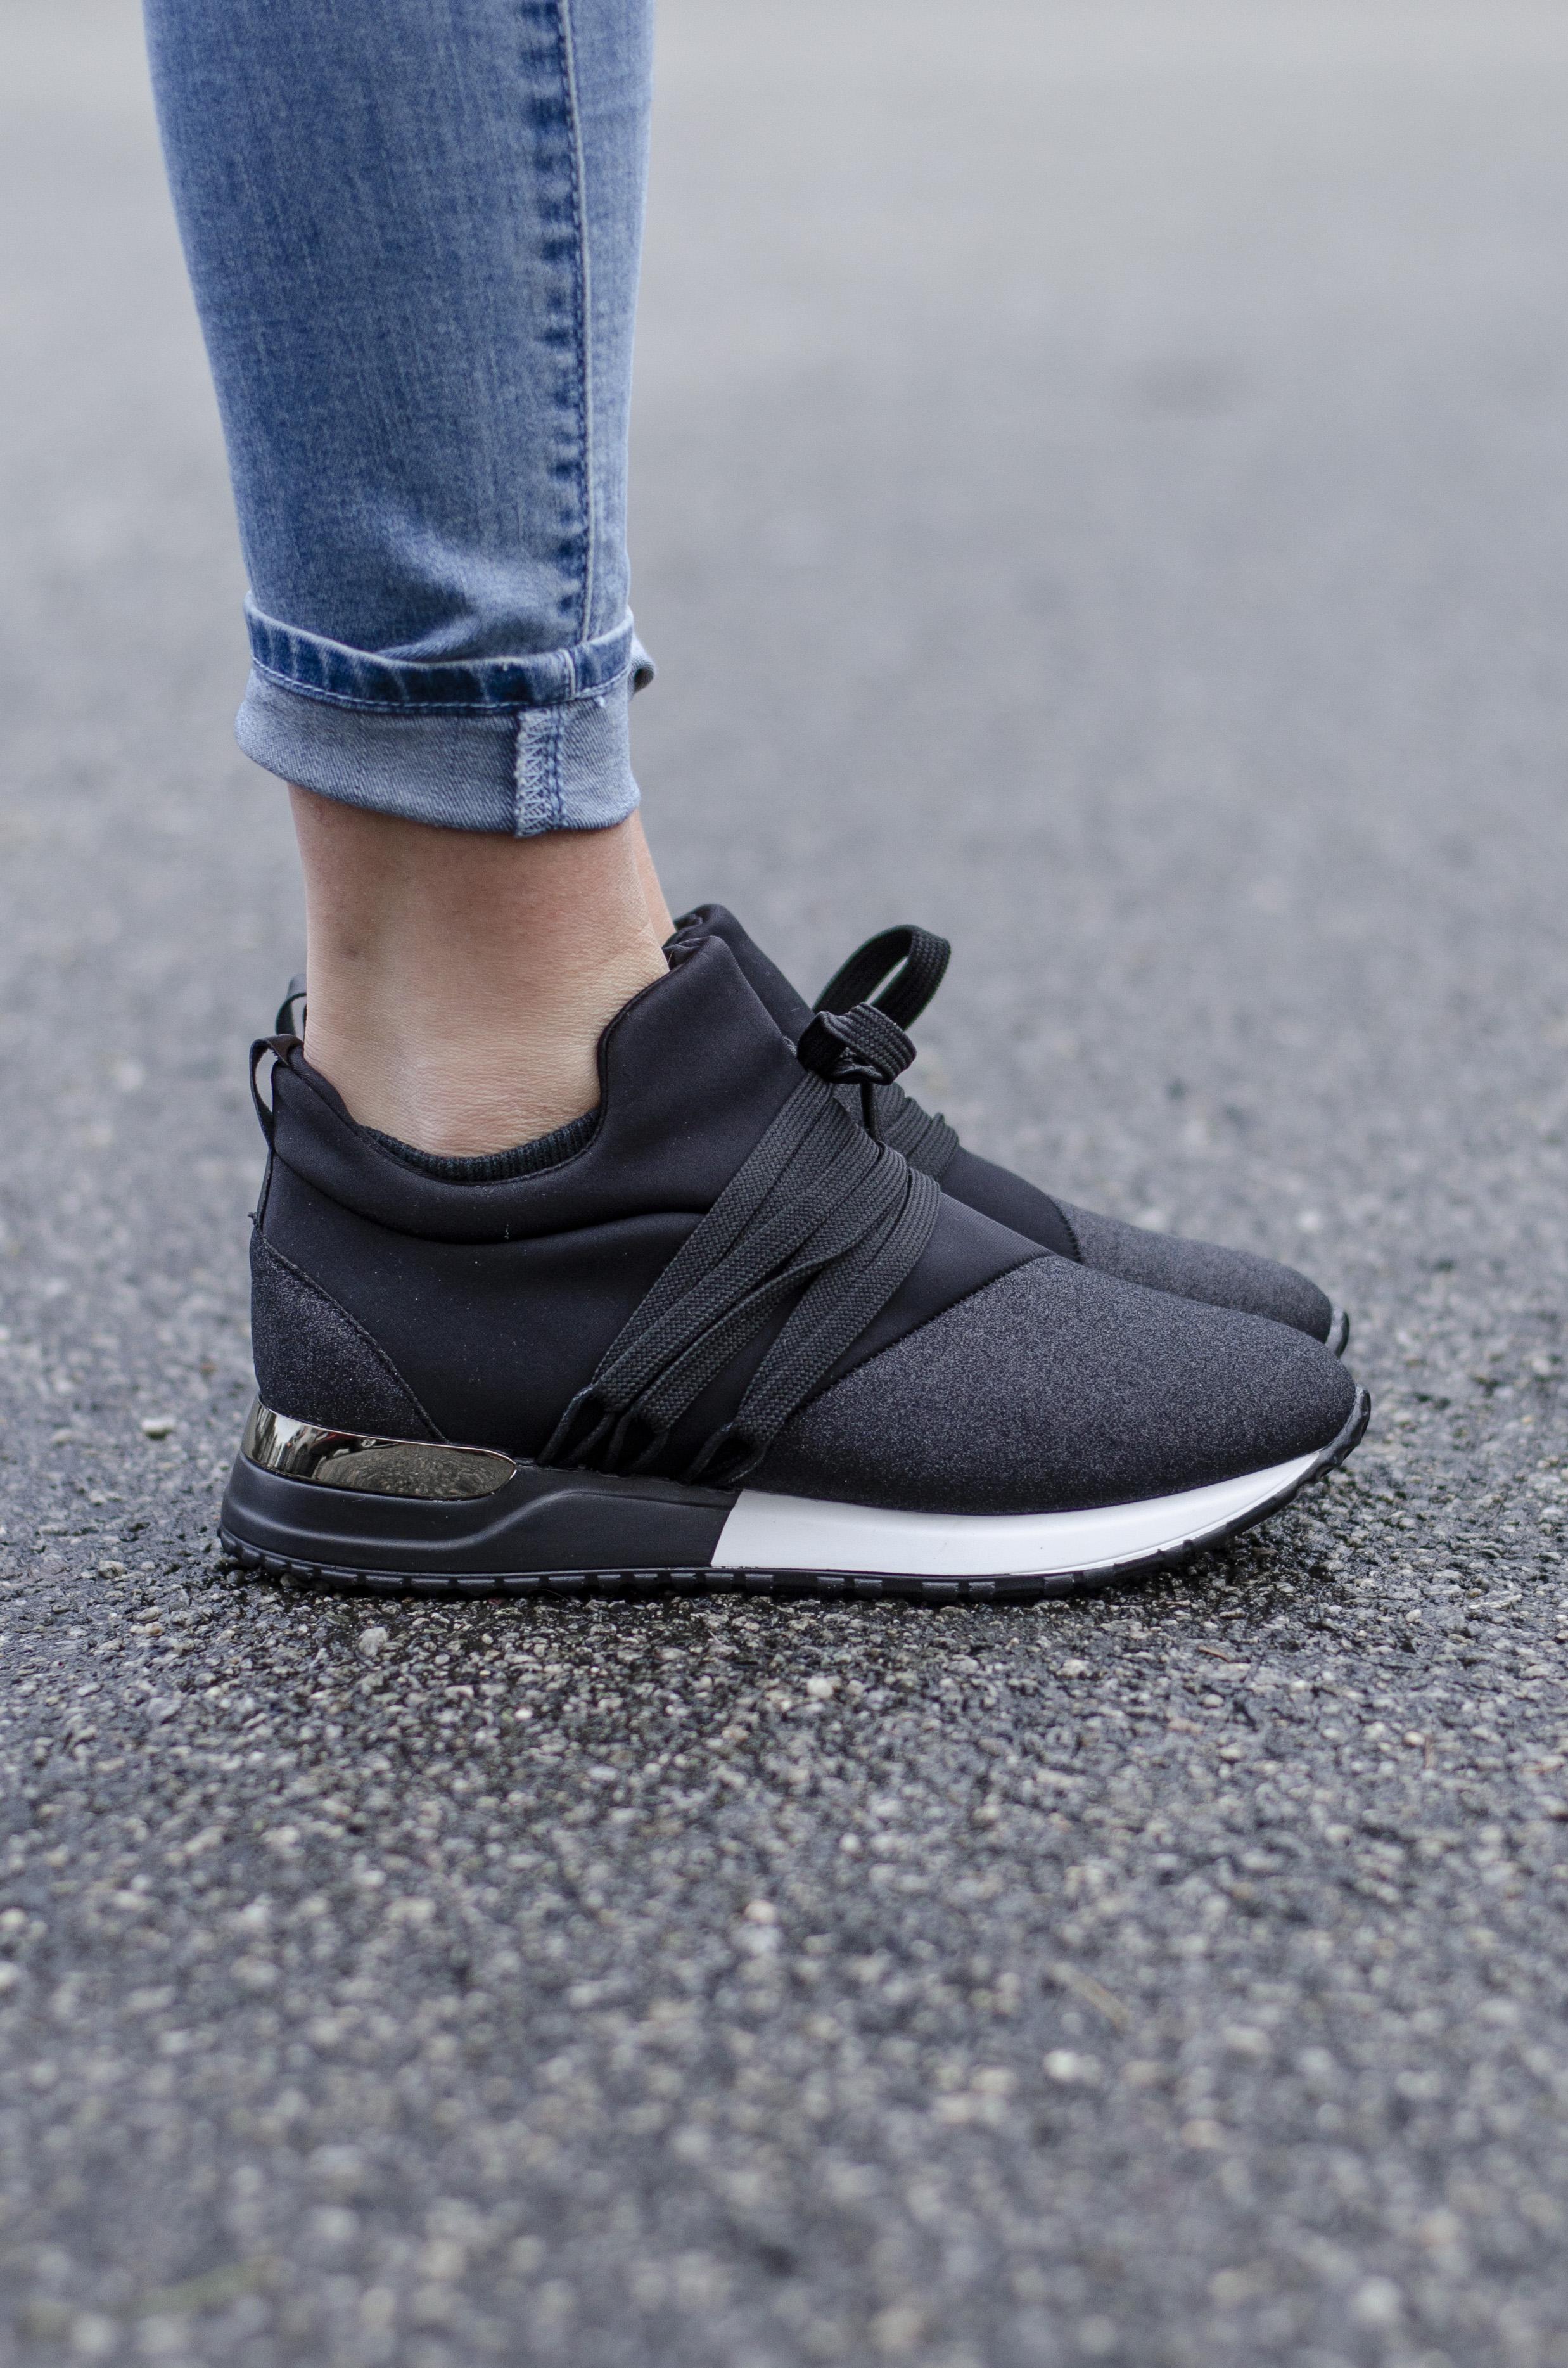 c73765a9 Motehus AS - Sneakers - Sofia svart